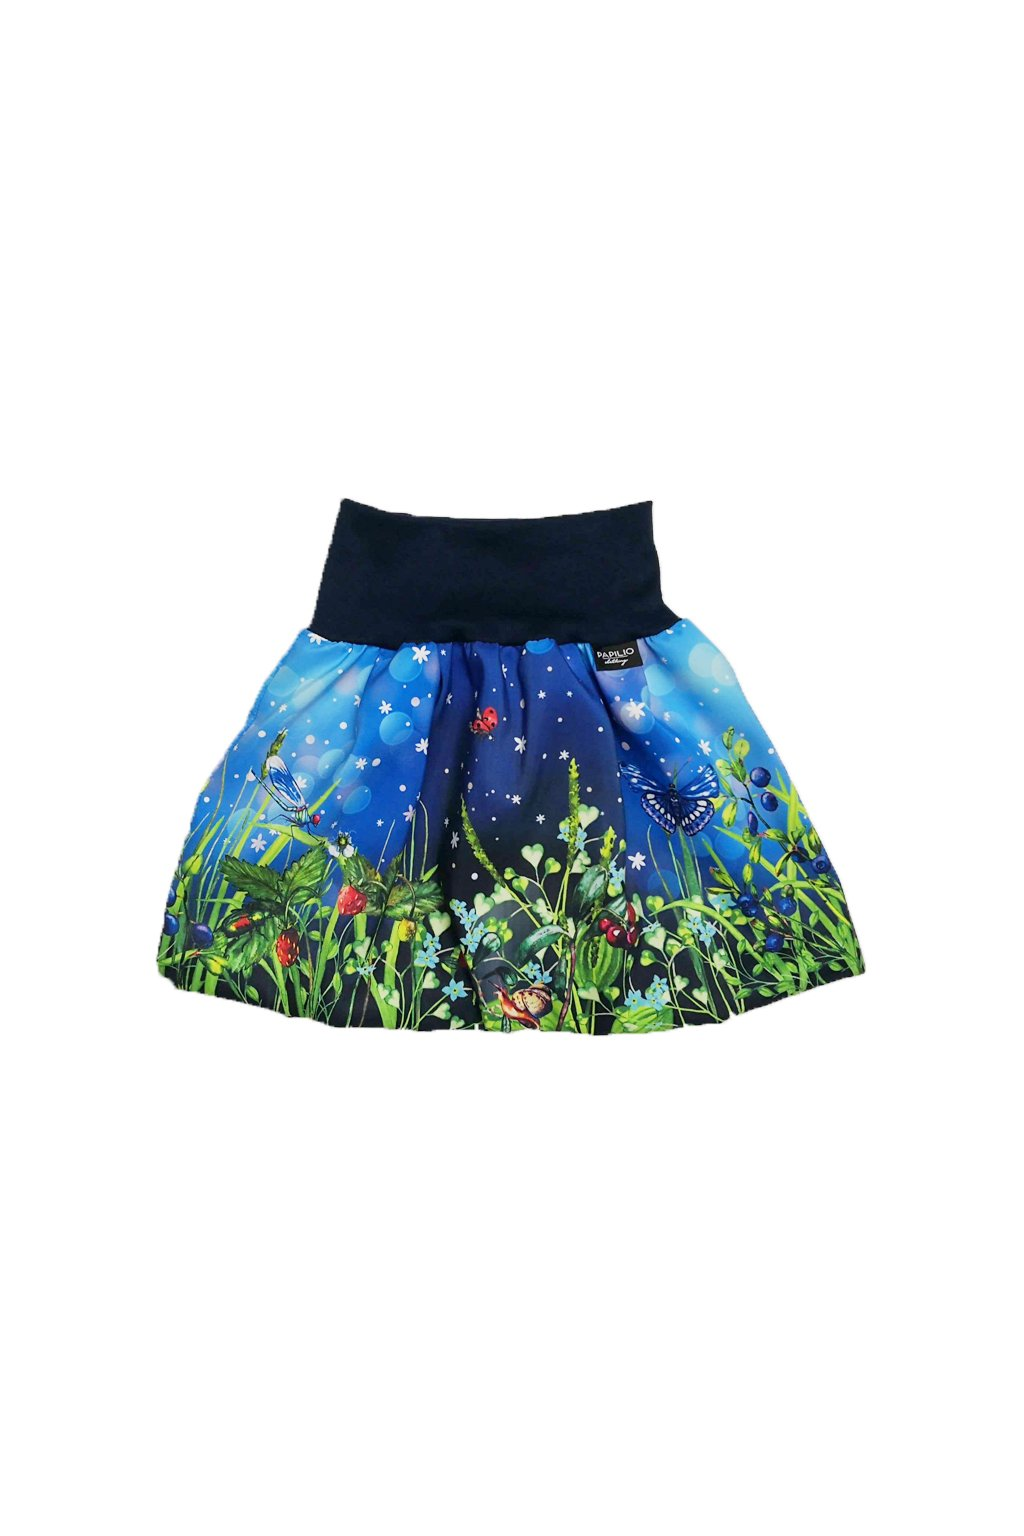 divci balonova sukne lesni jahudky III papilio clothing